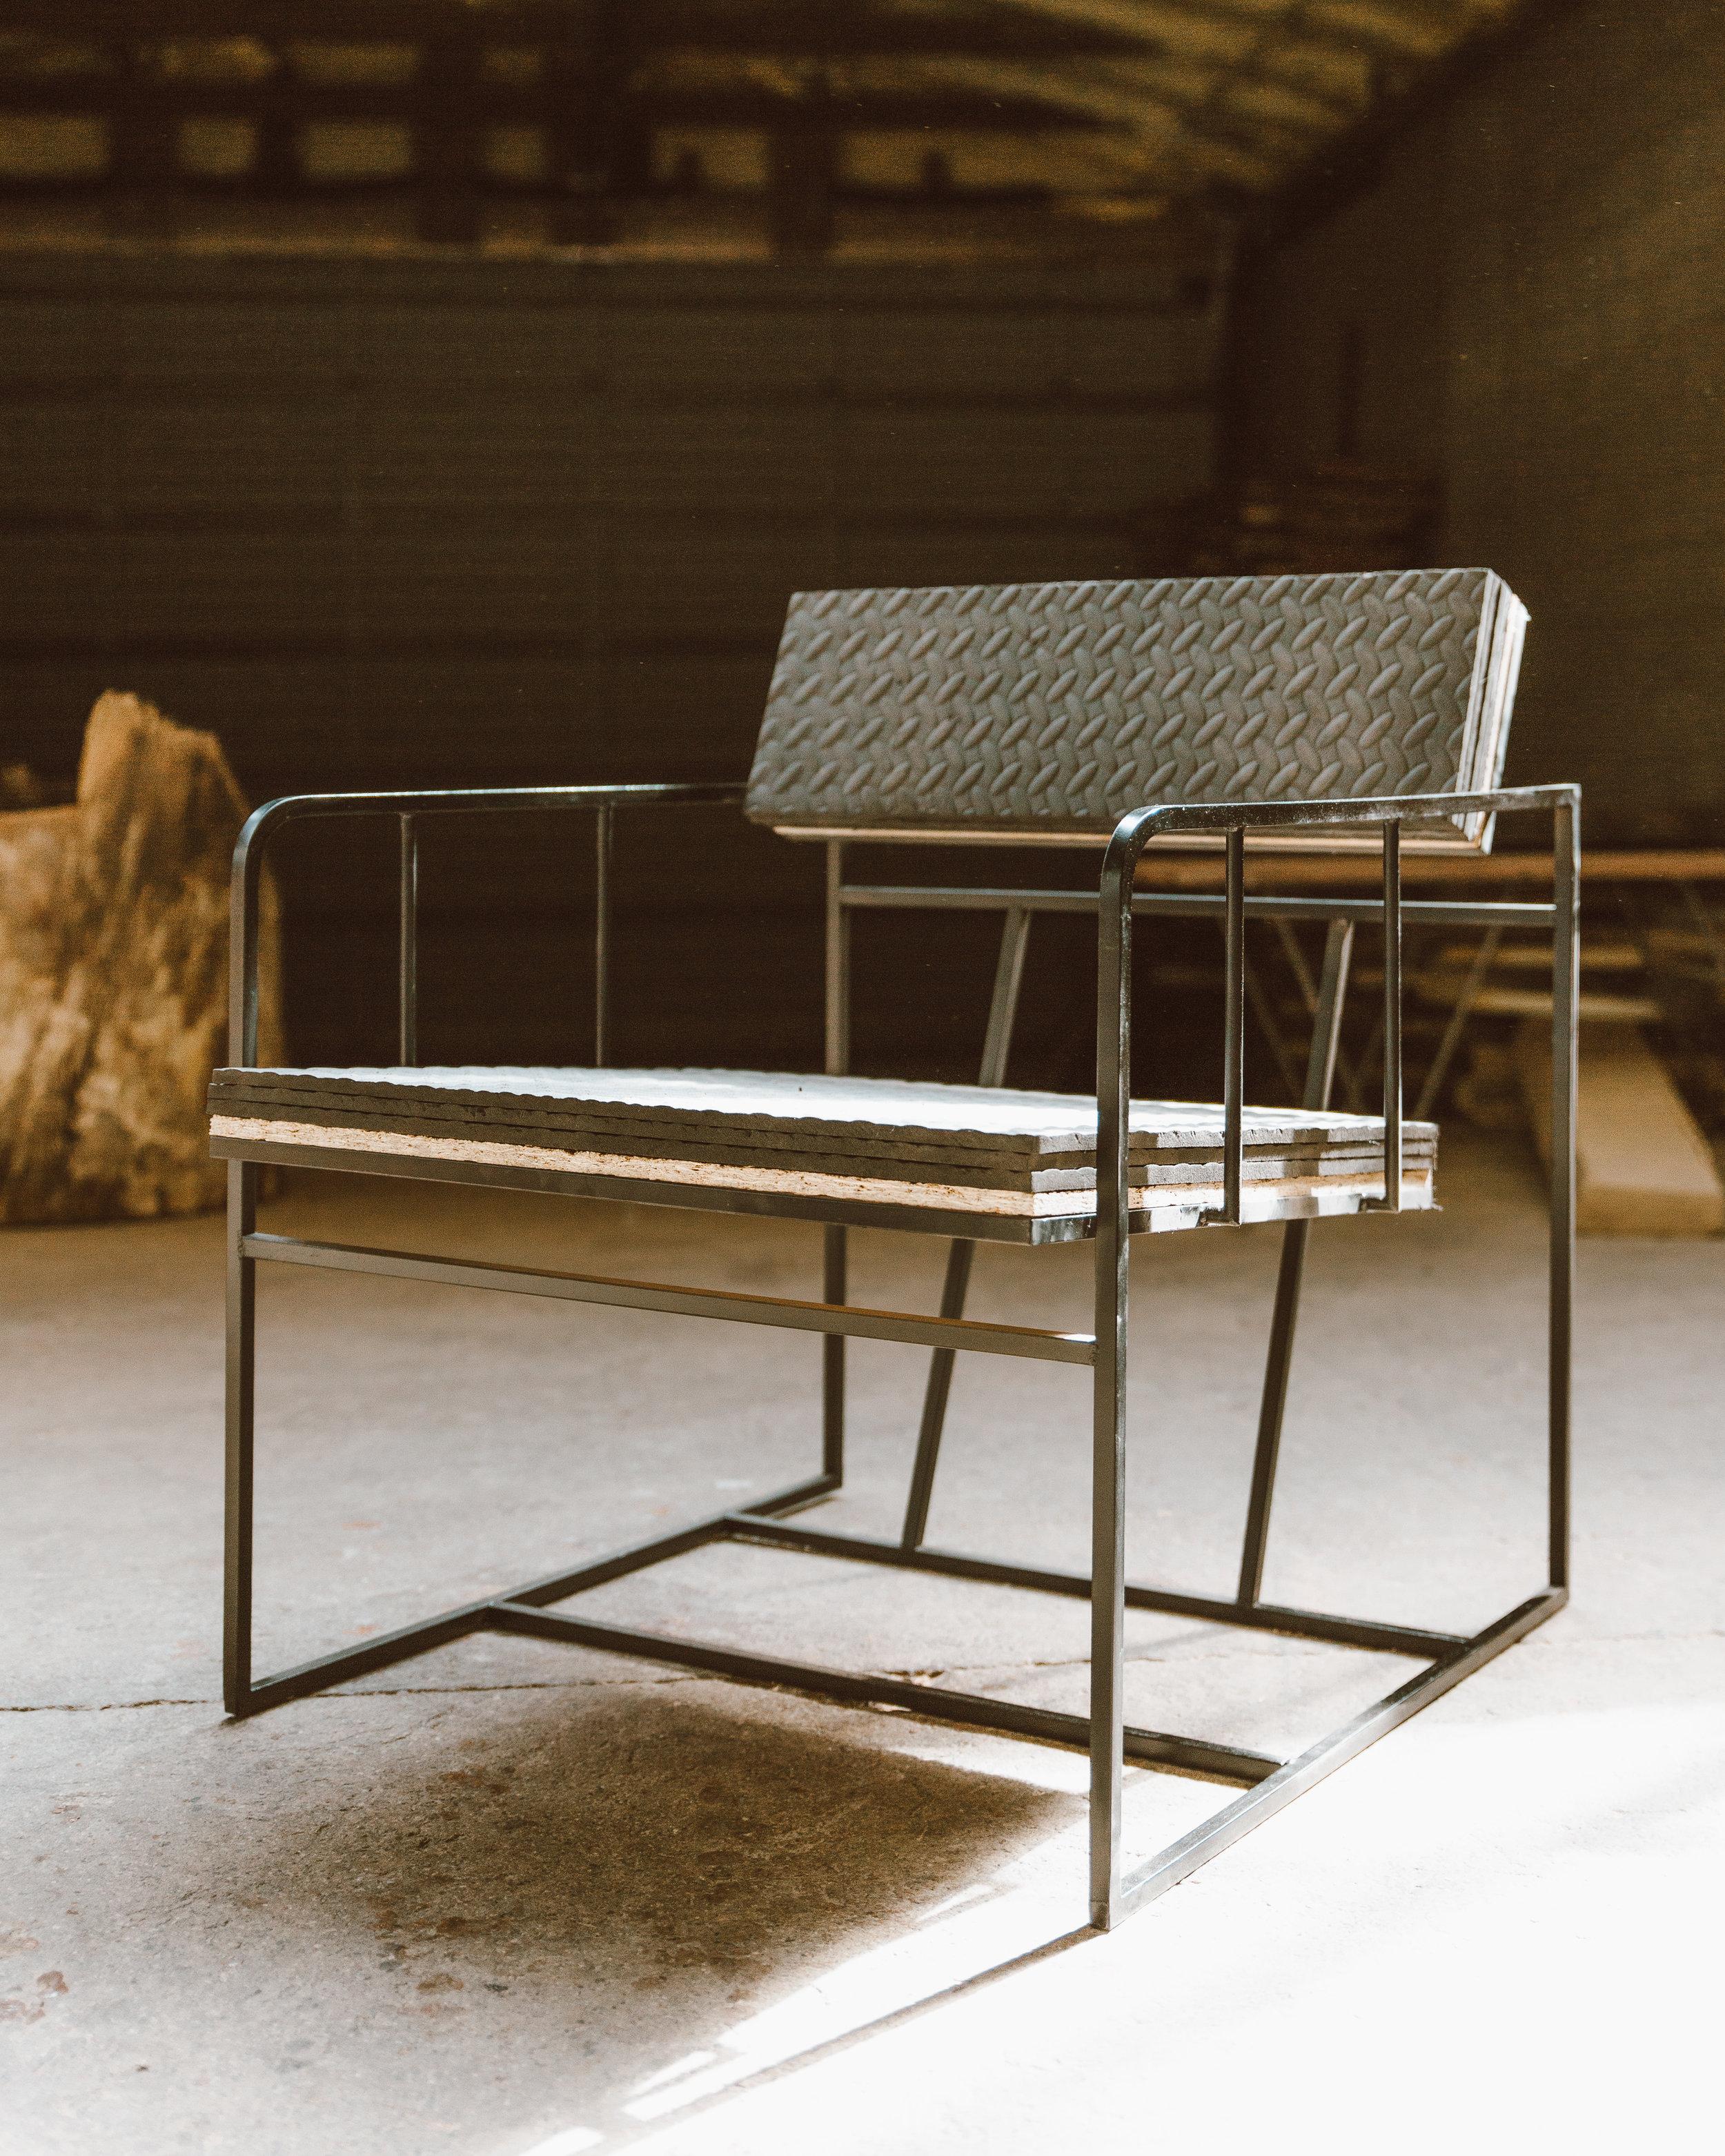 forthehome-edgework-creative-stools08.jpg